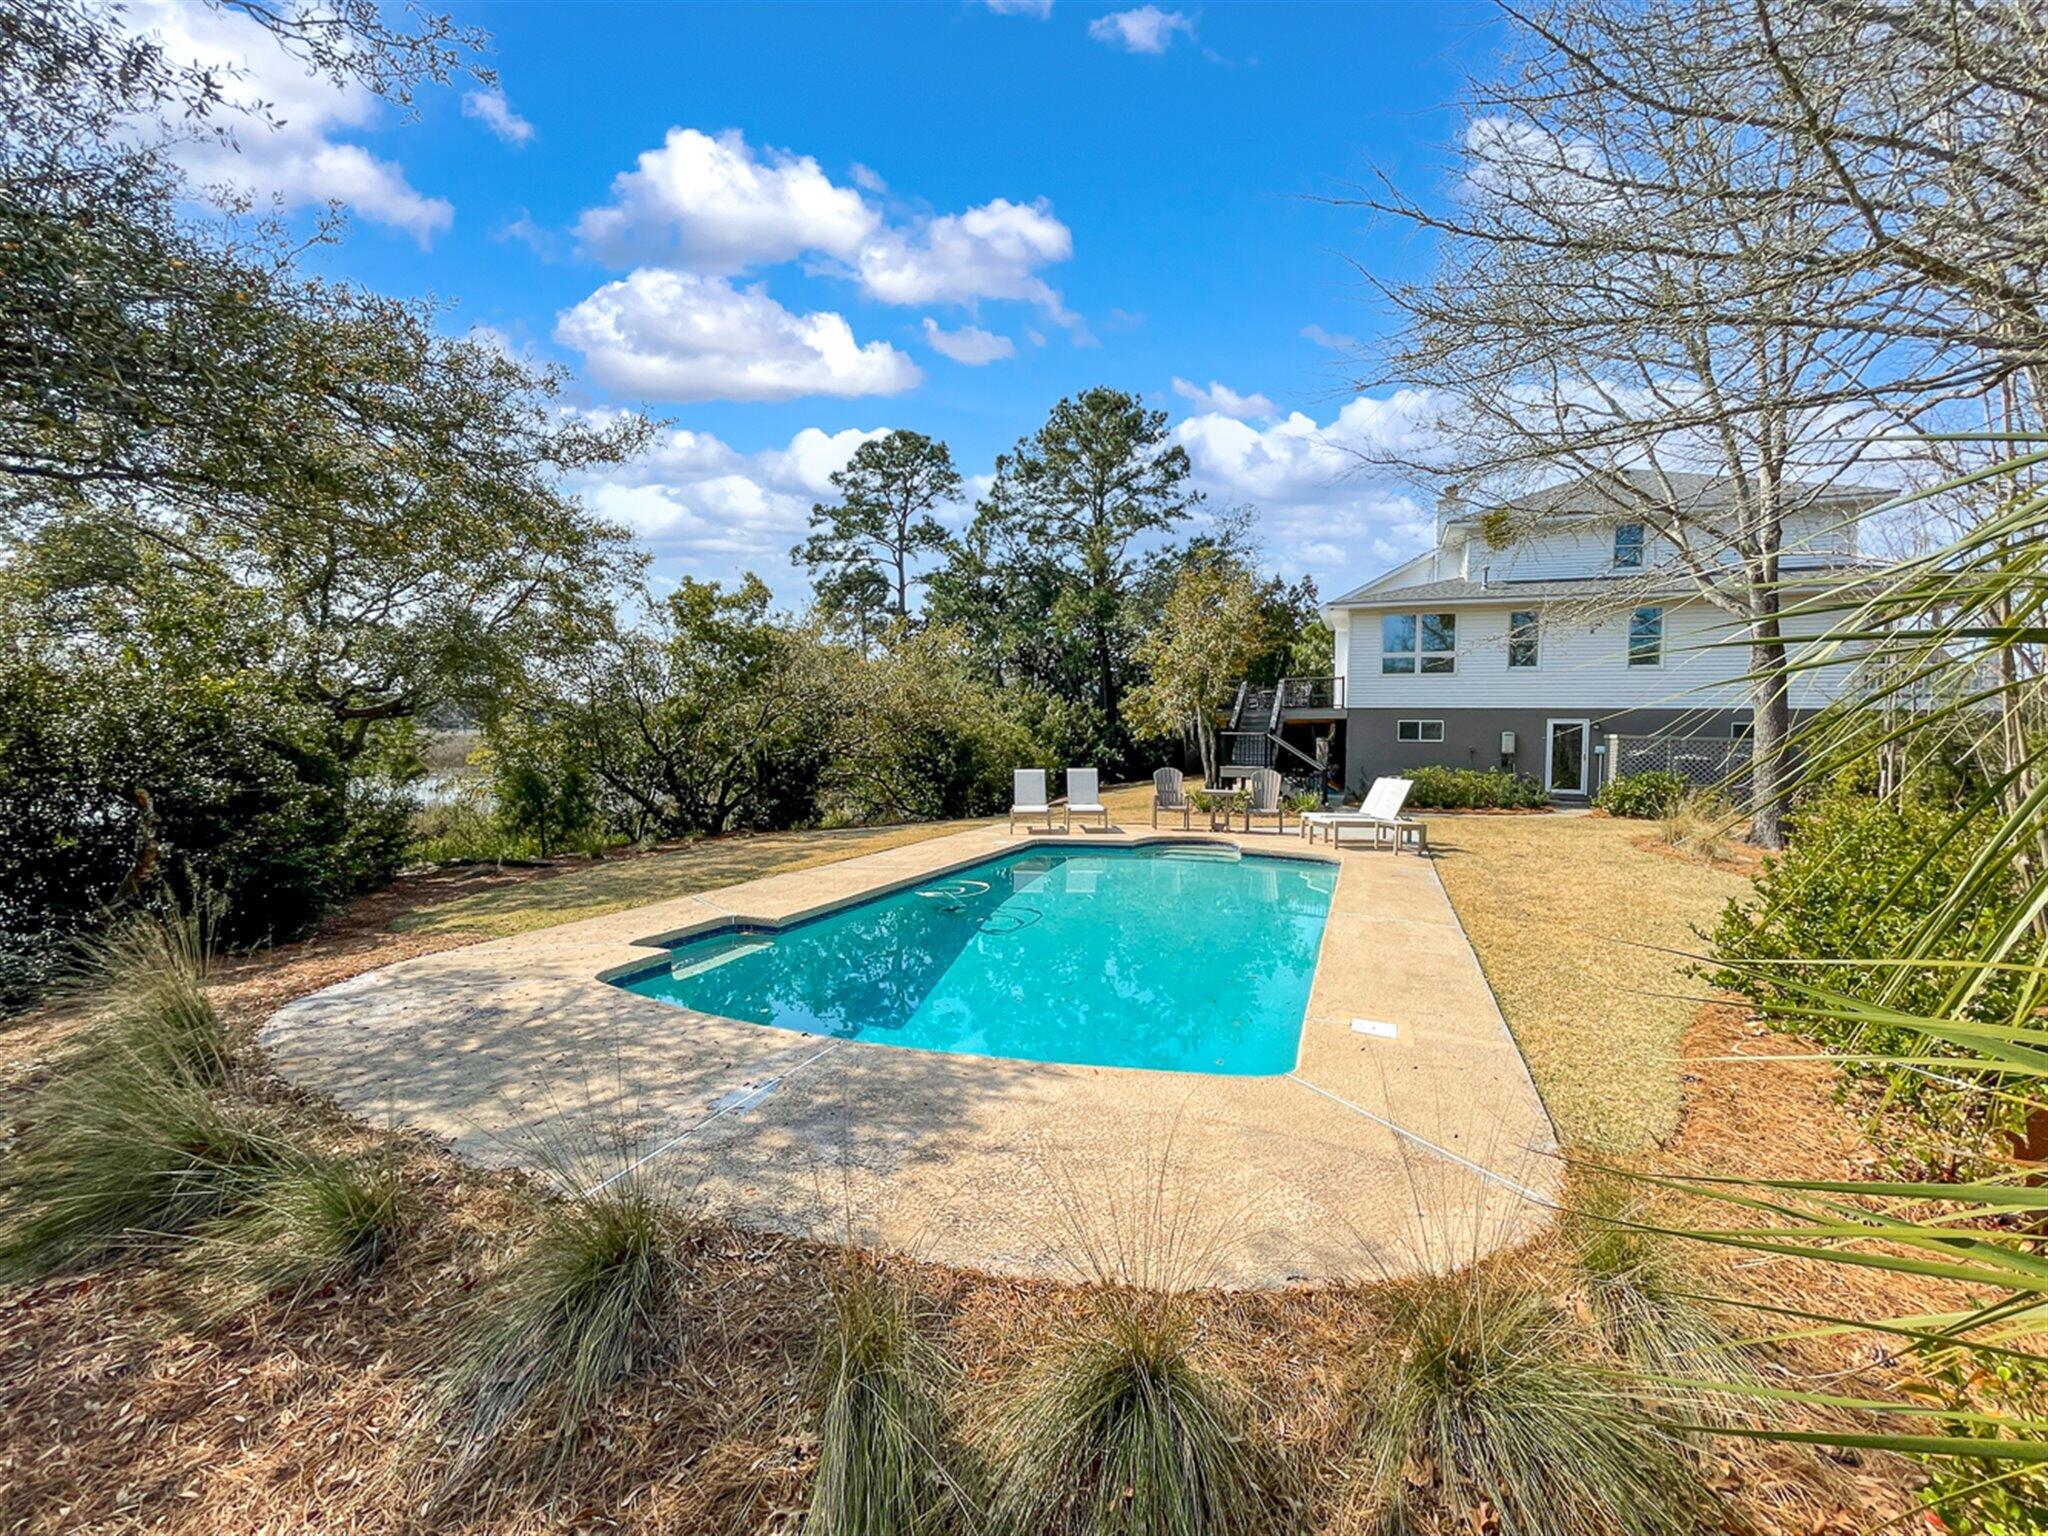 Indigo Point Homes For Sale - 50 Indigo Point, Charleston, SC - 36